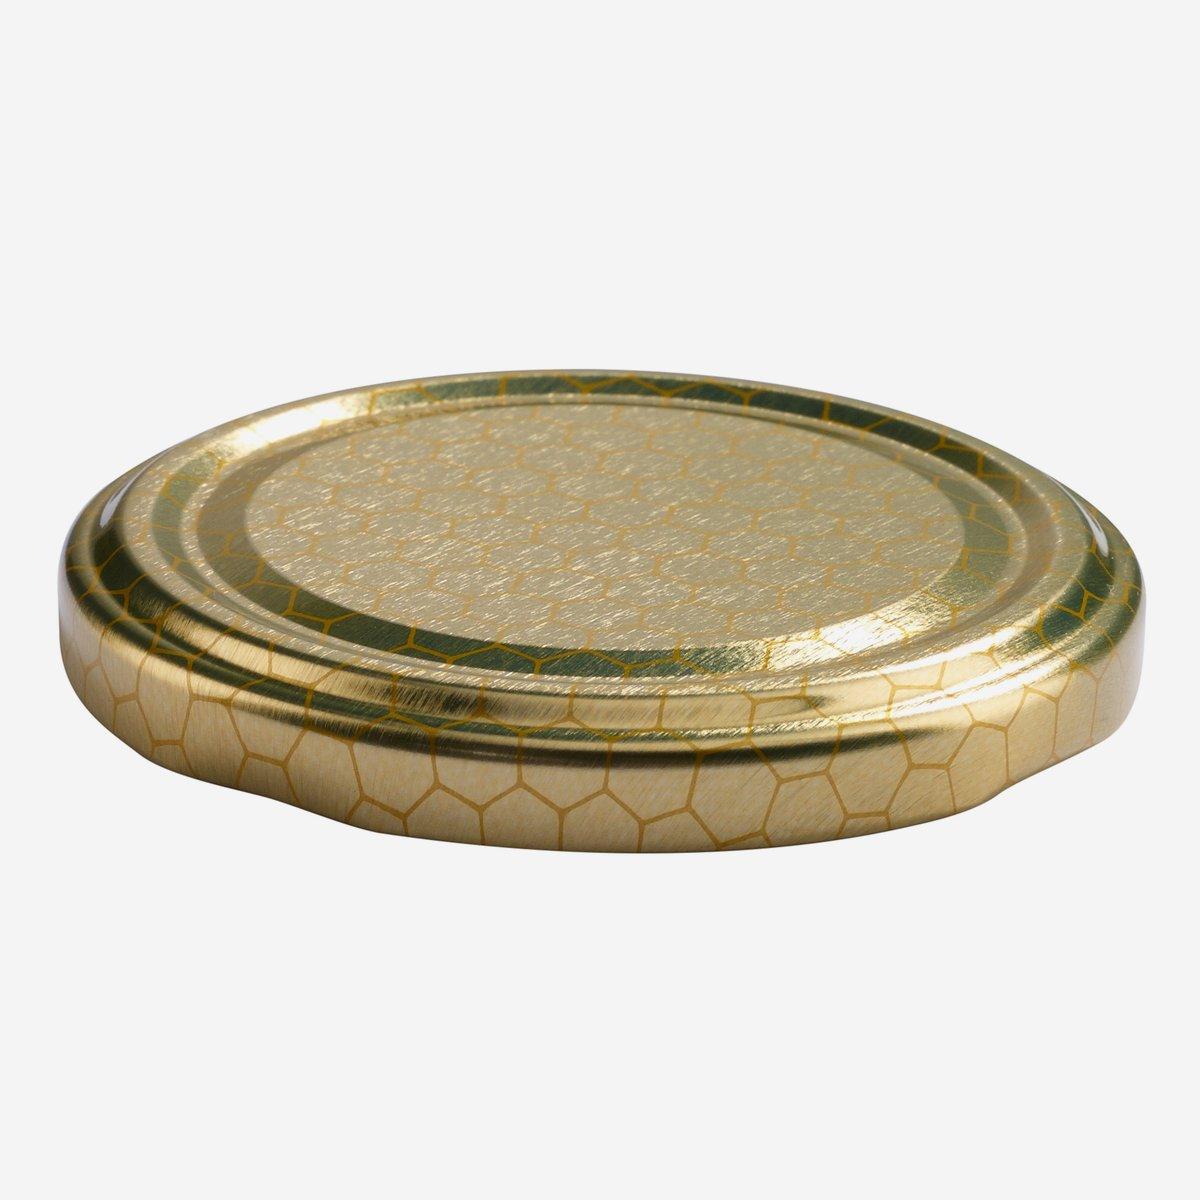 twist off deckel 70mm gold mit wabendekor karton online bestellen. Black Bedroom Furniture Sets. Home Design Ideas